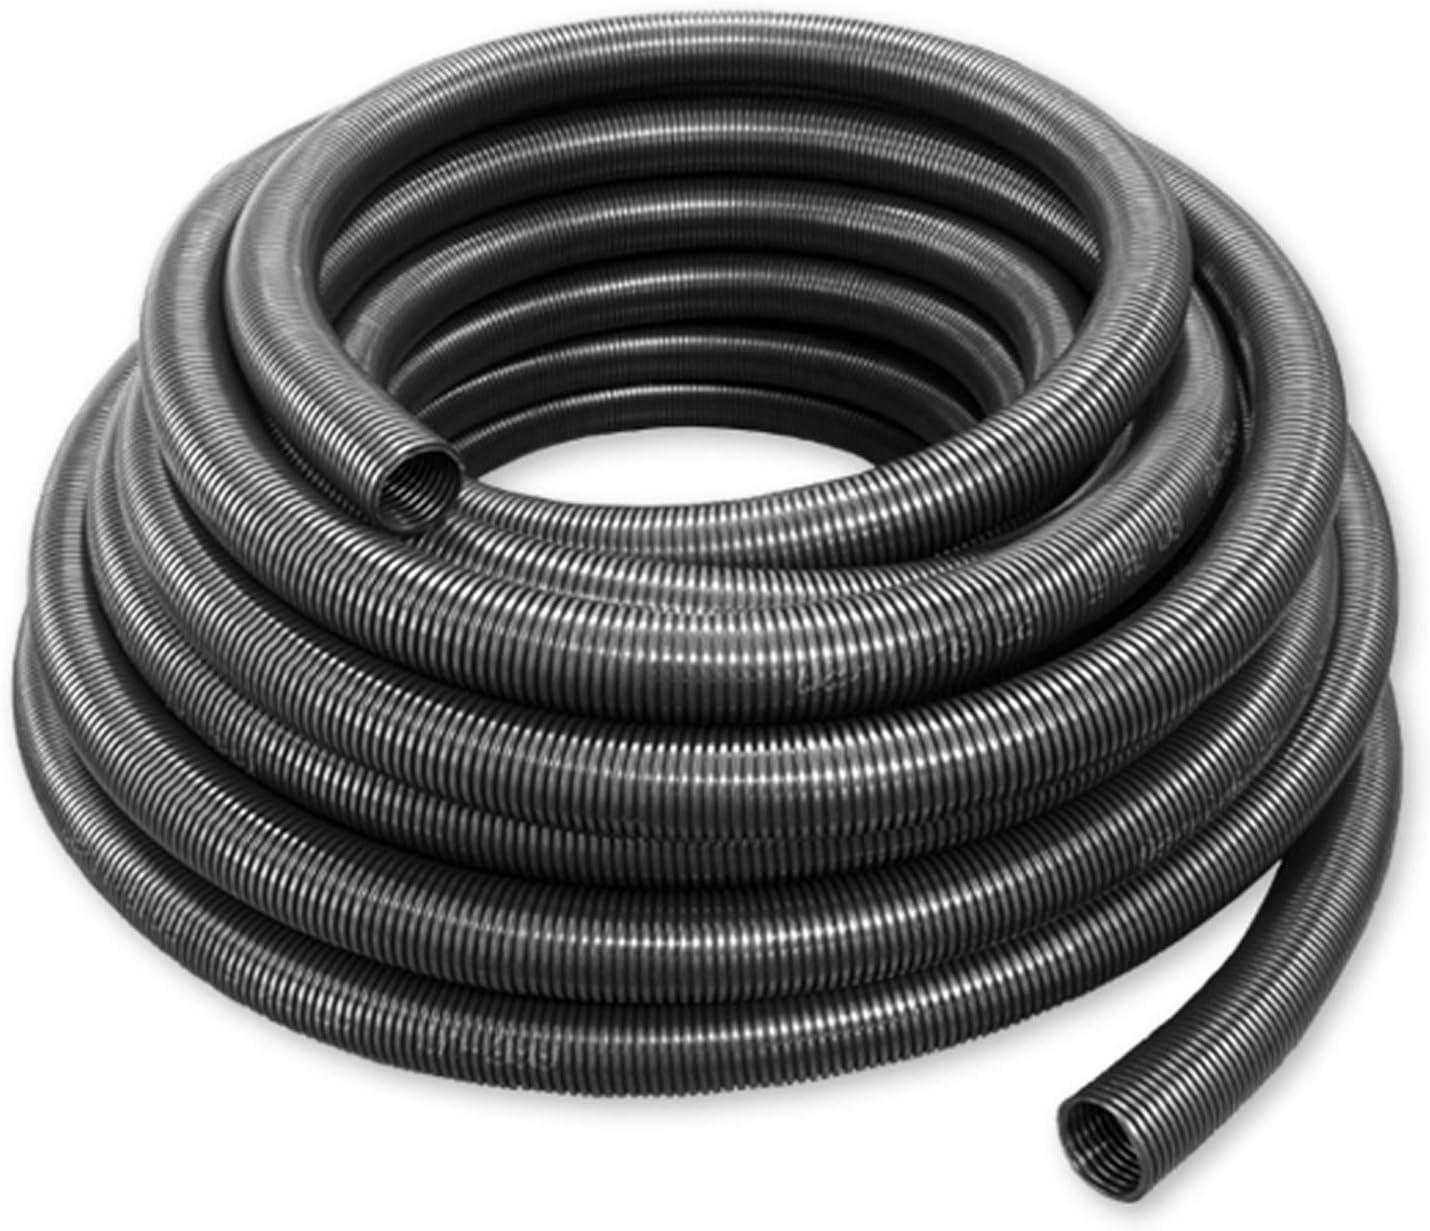 10m of 32mm Black Flexible PVC Covered Steel Conduit Kopex IP54 Rated